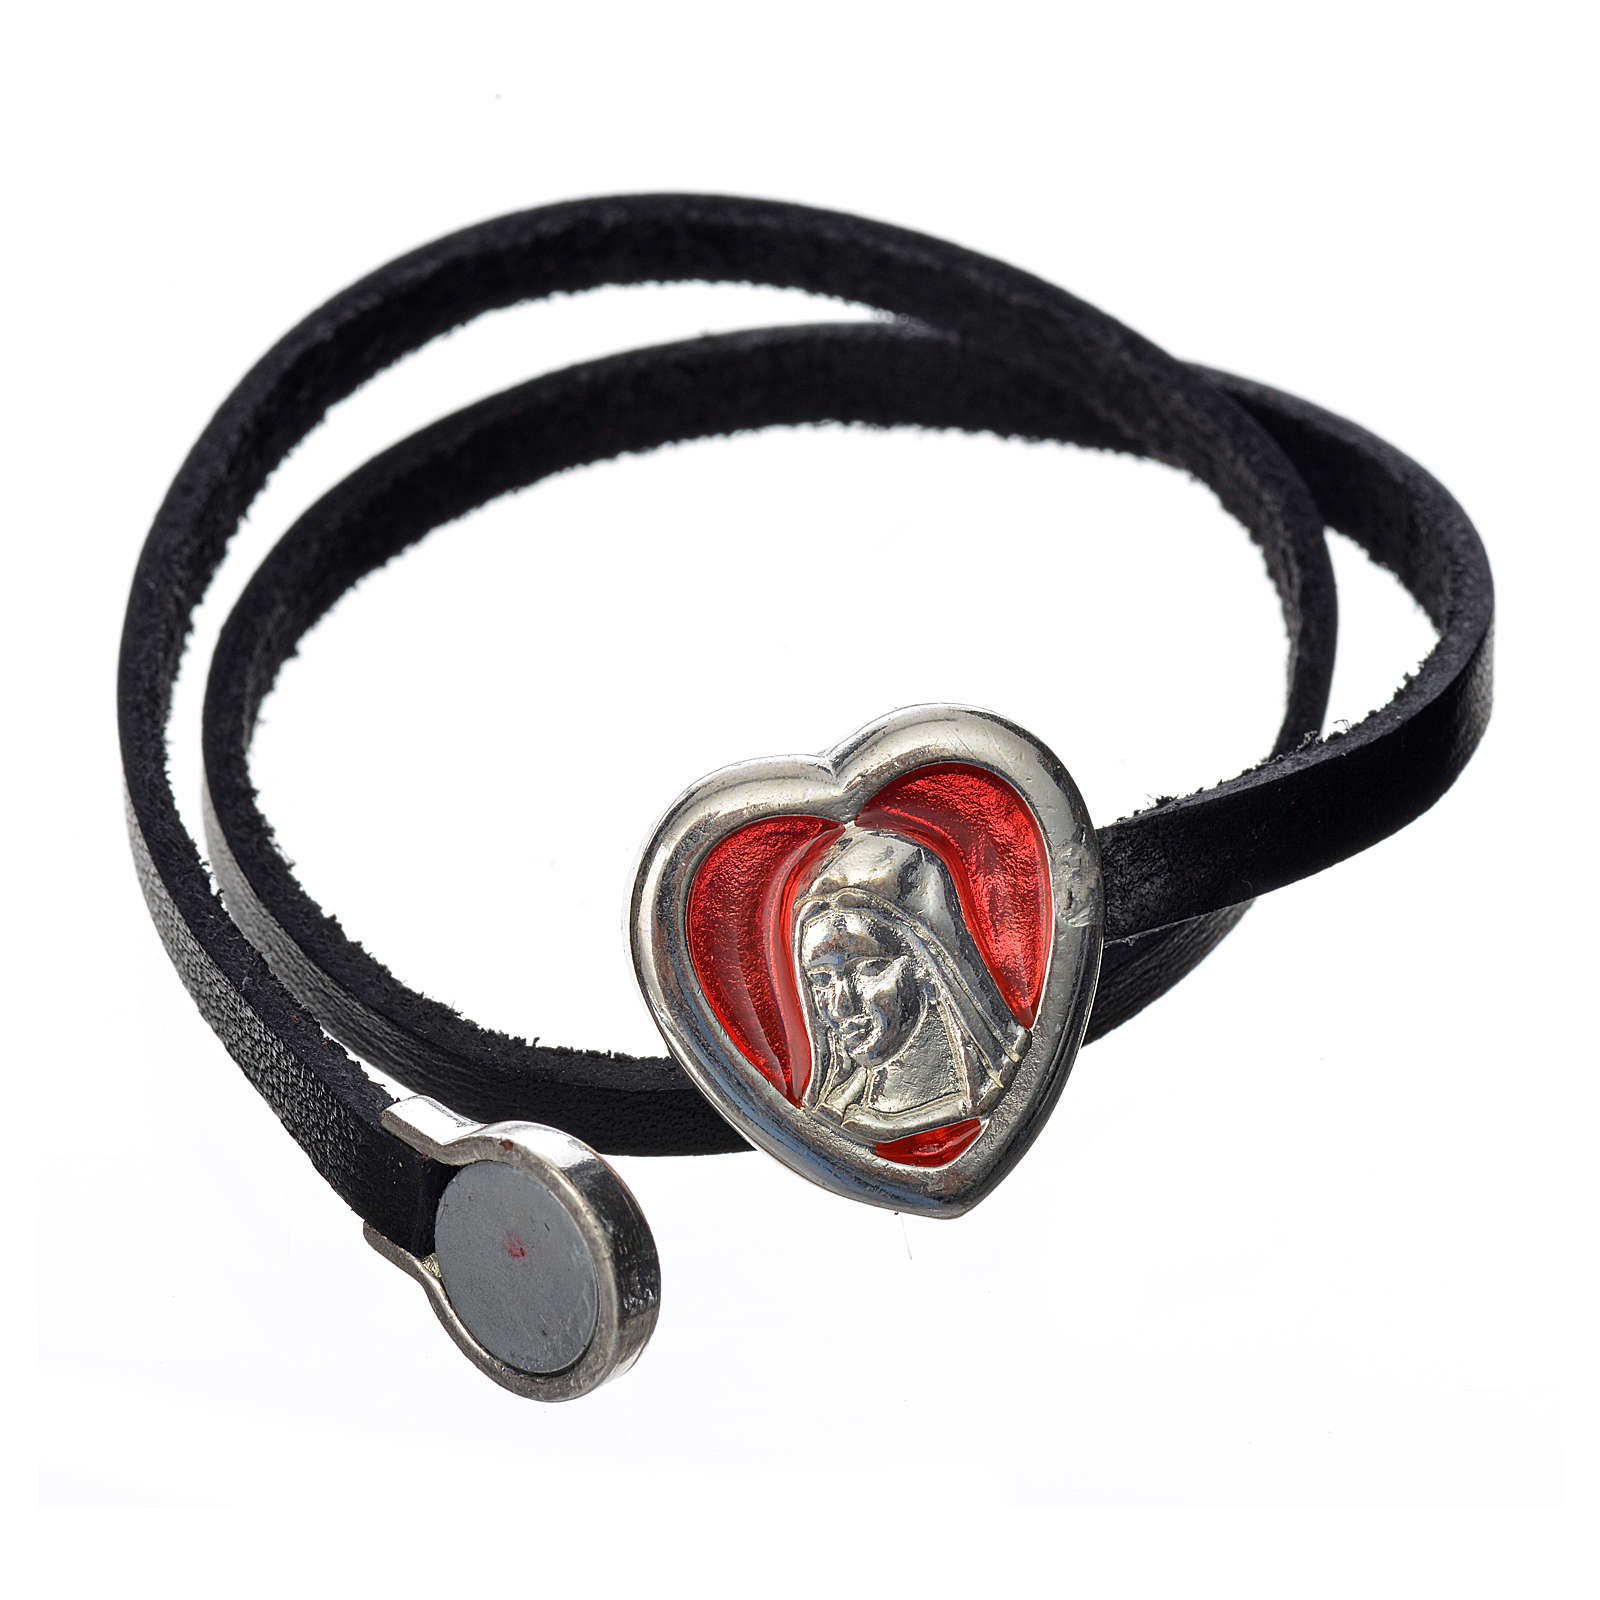 Bracelet in black leather with Virgin Mary pendant red enamel 4